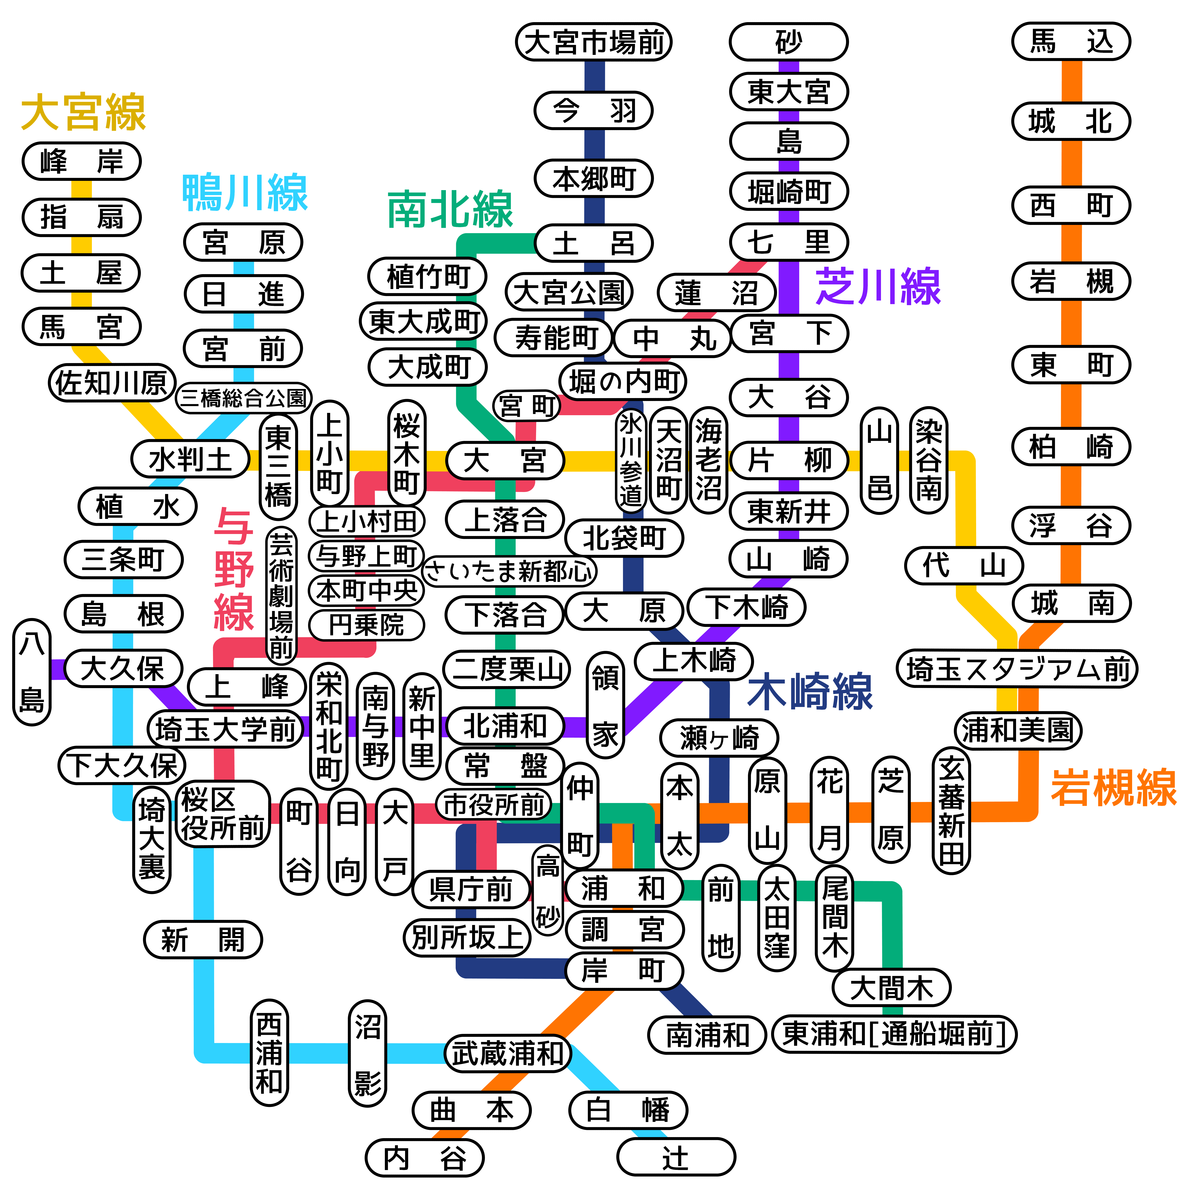 f:id:HOSHIIMO:20210723041247p:plain